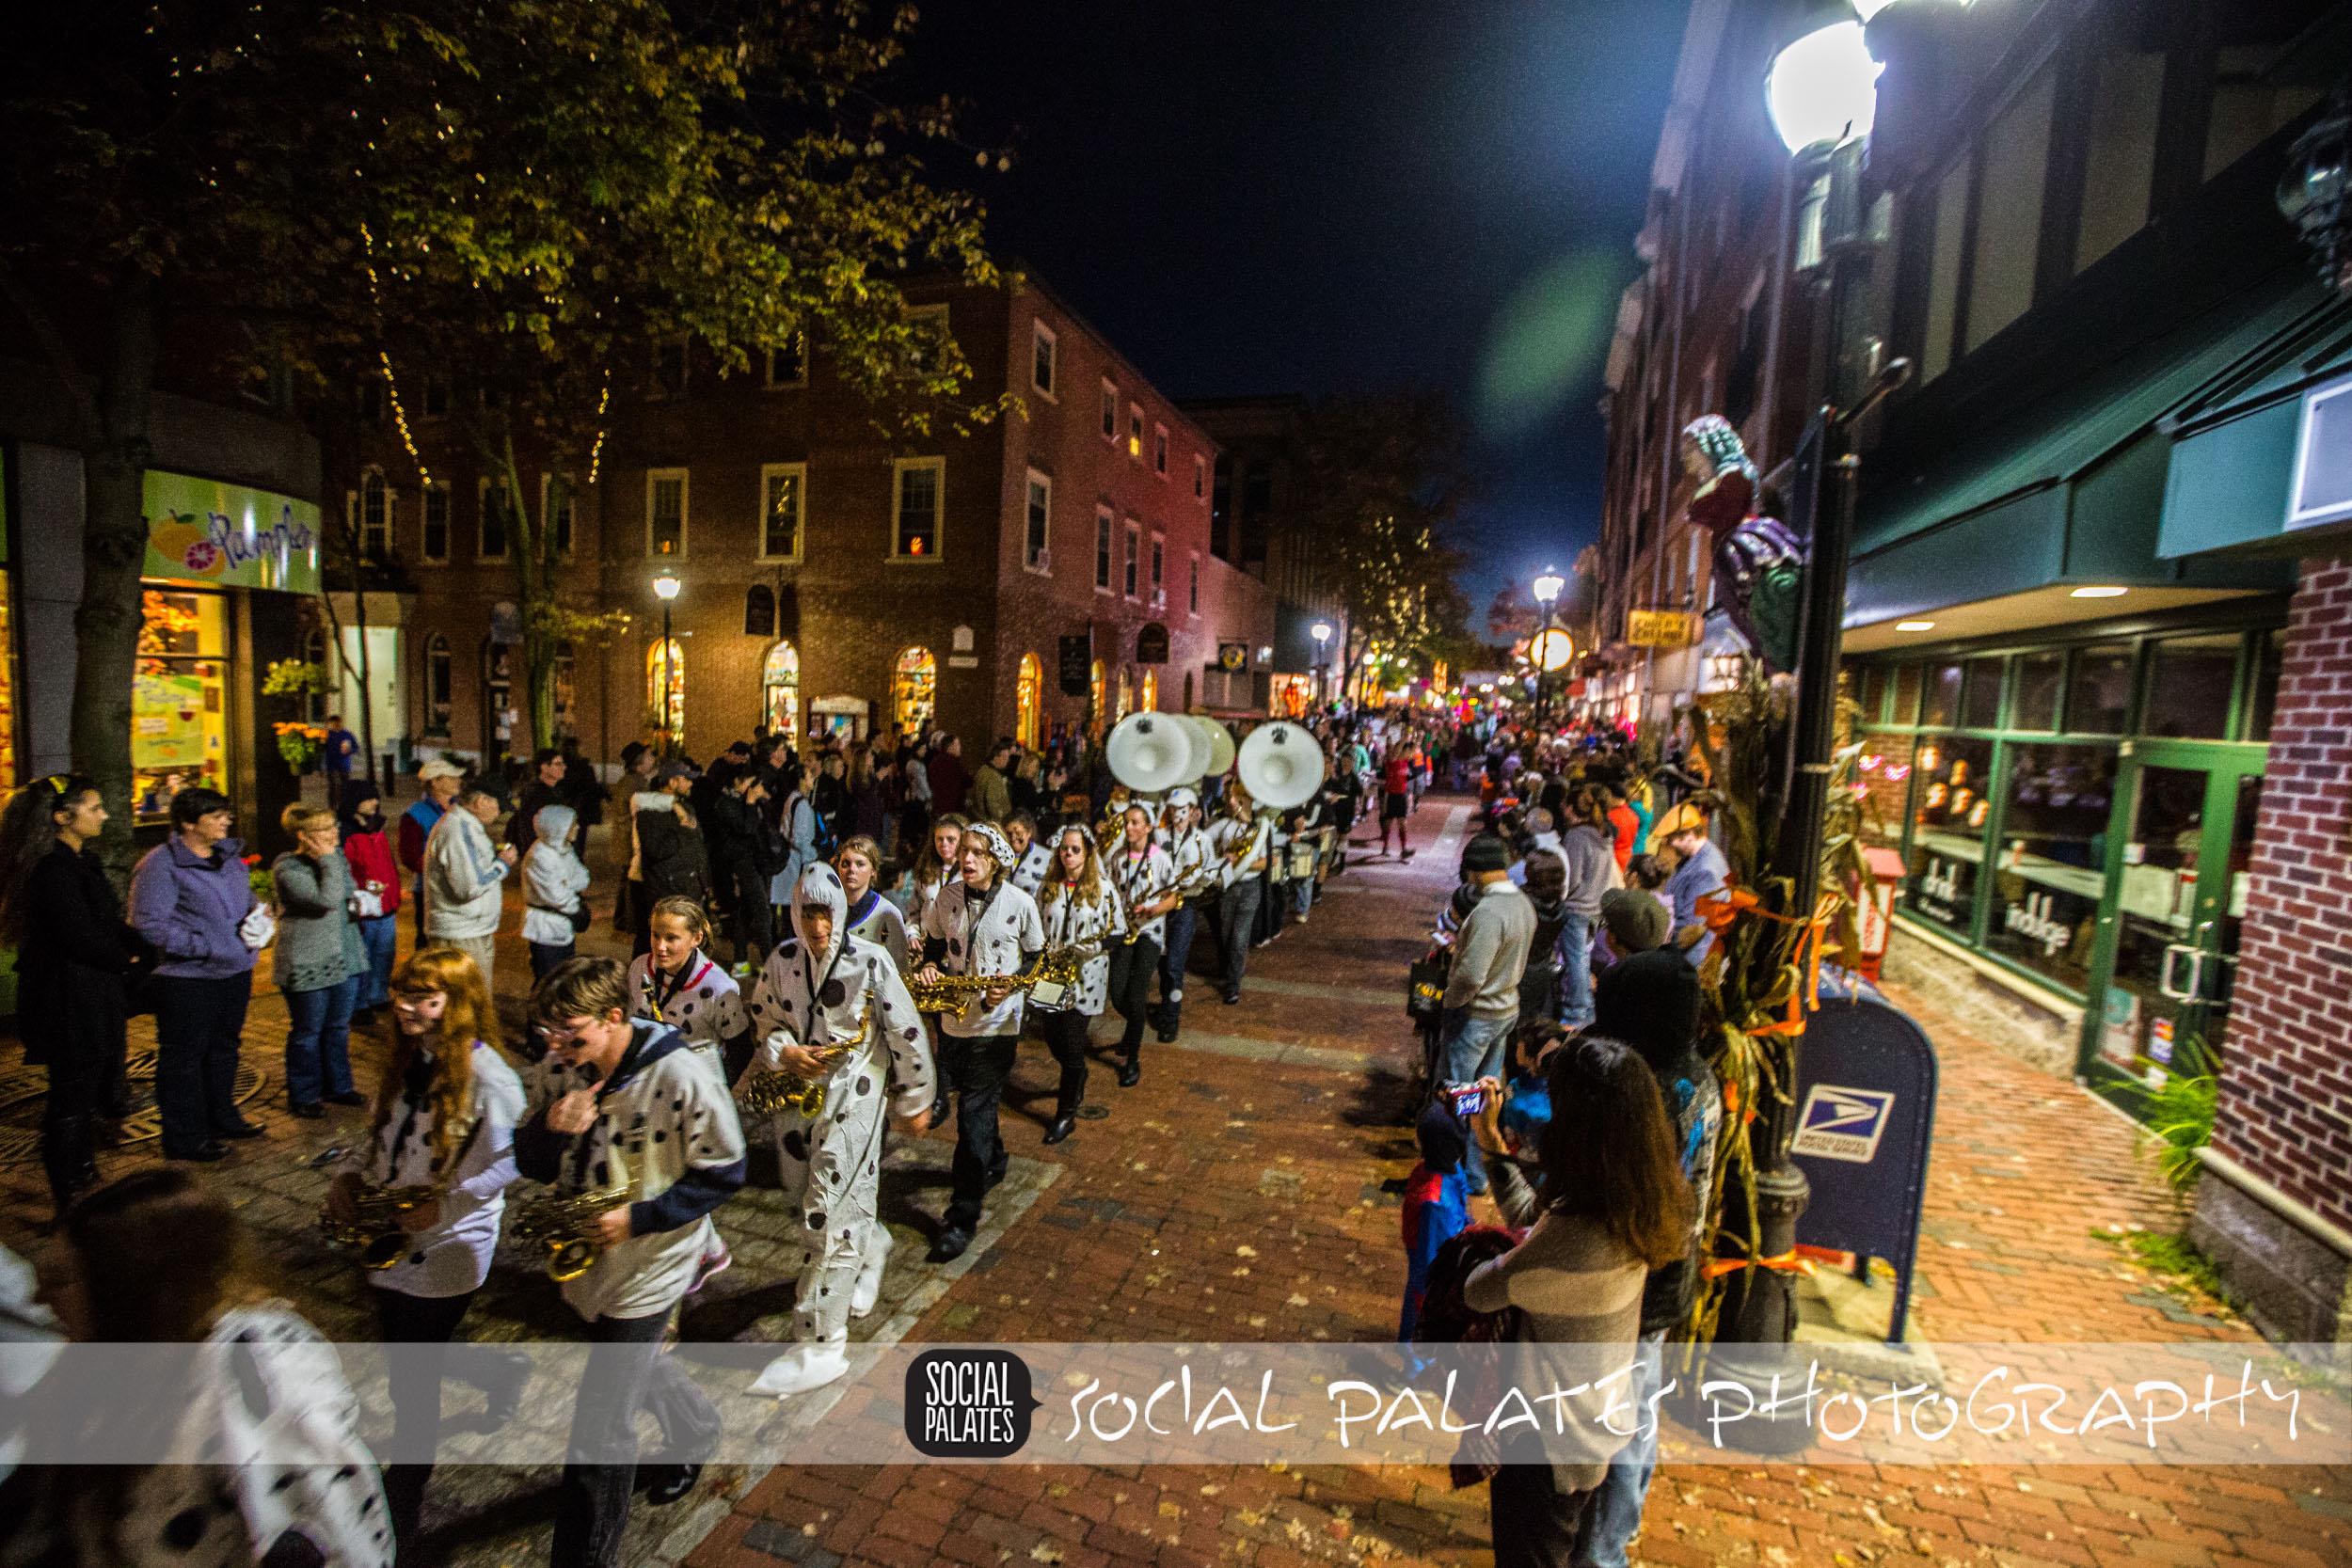 Haunted Happenings Parade 2014 Creative Salem by Social Palates-7625.jpg